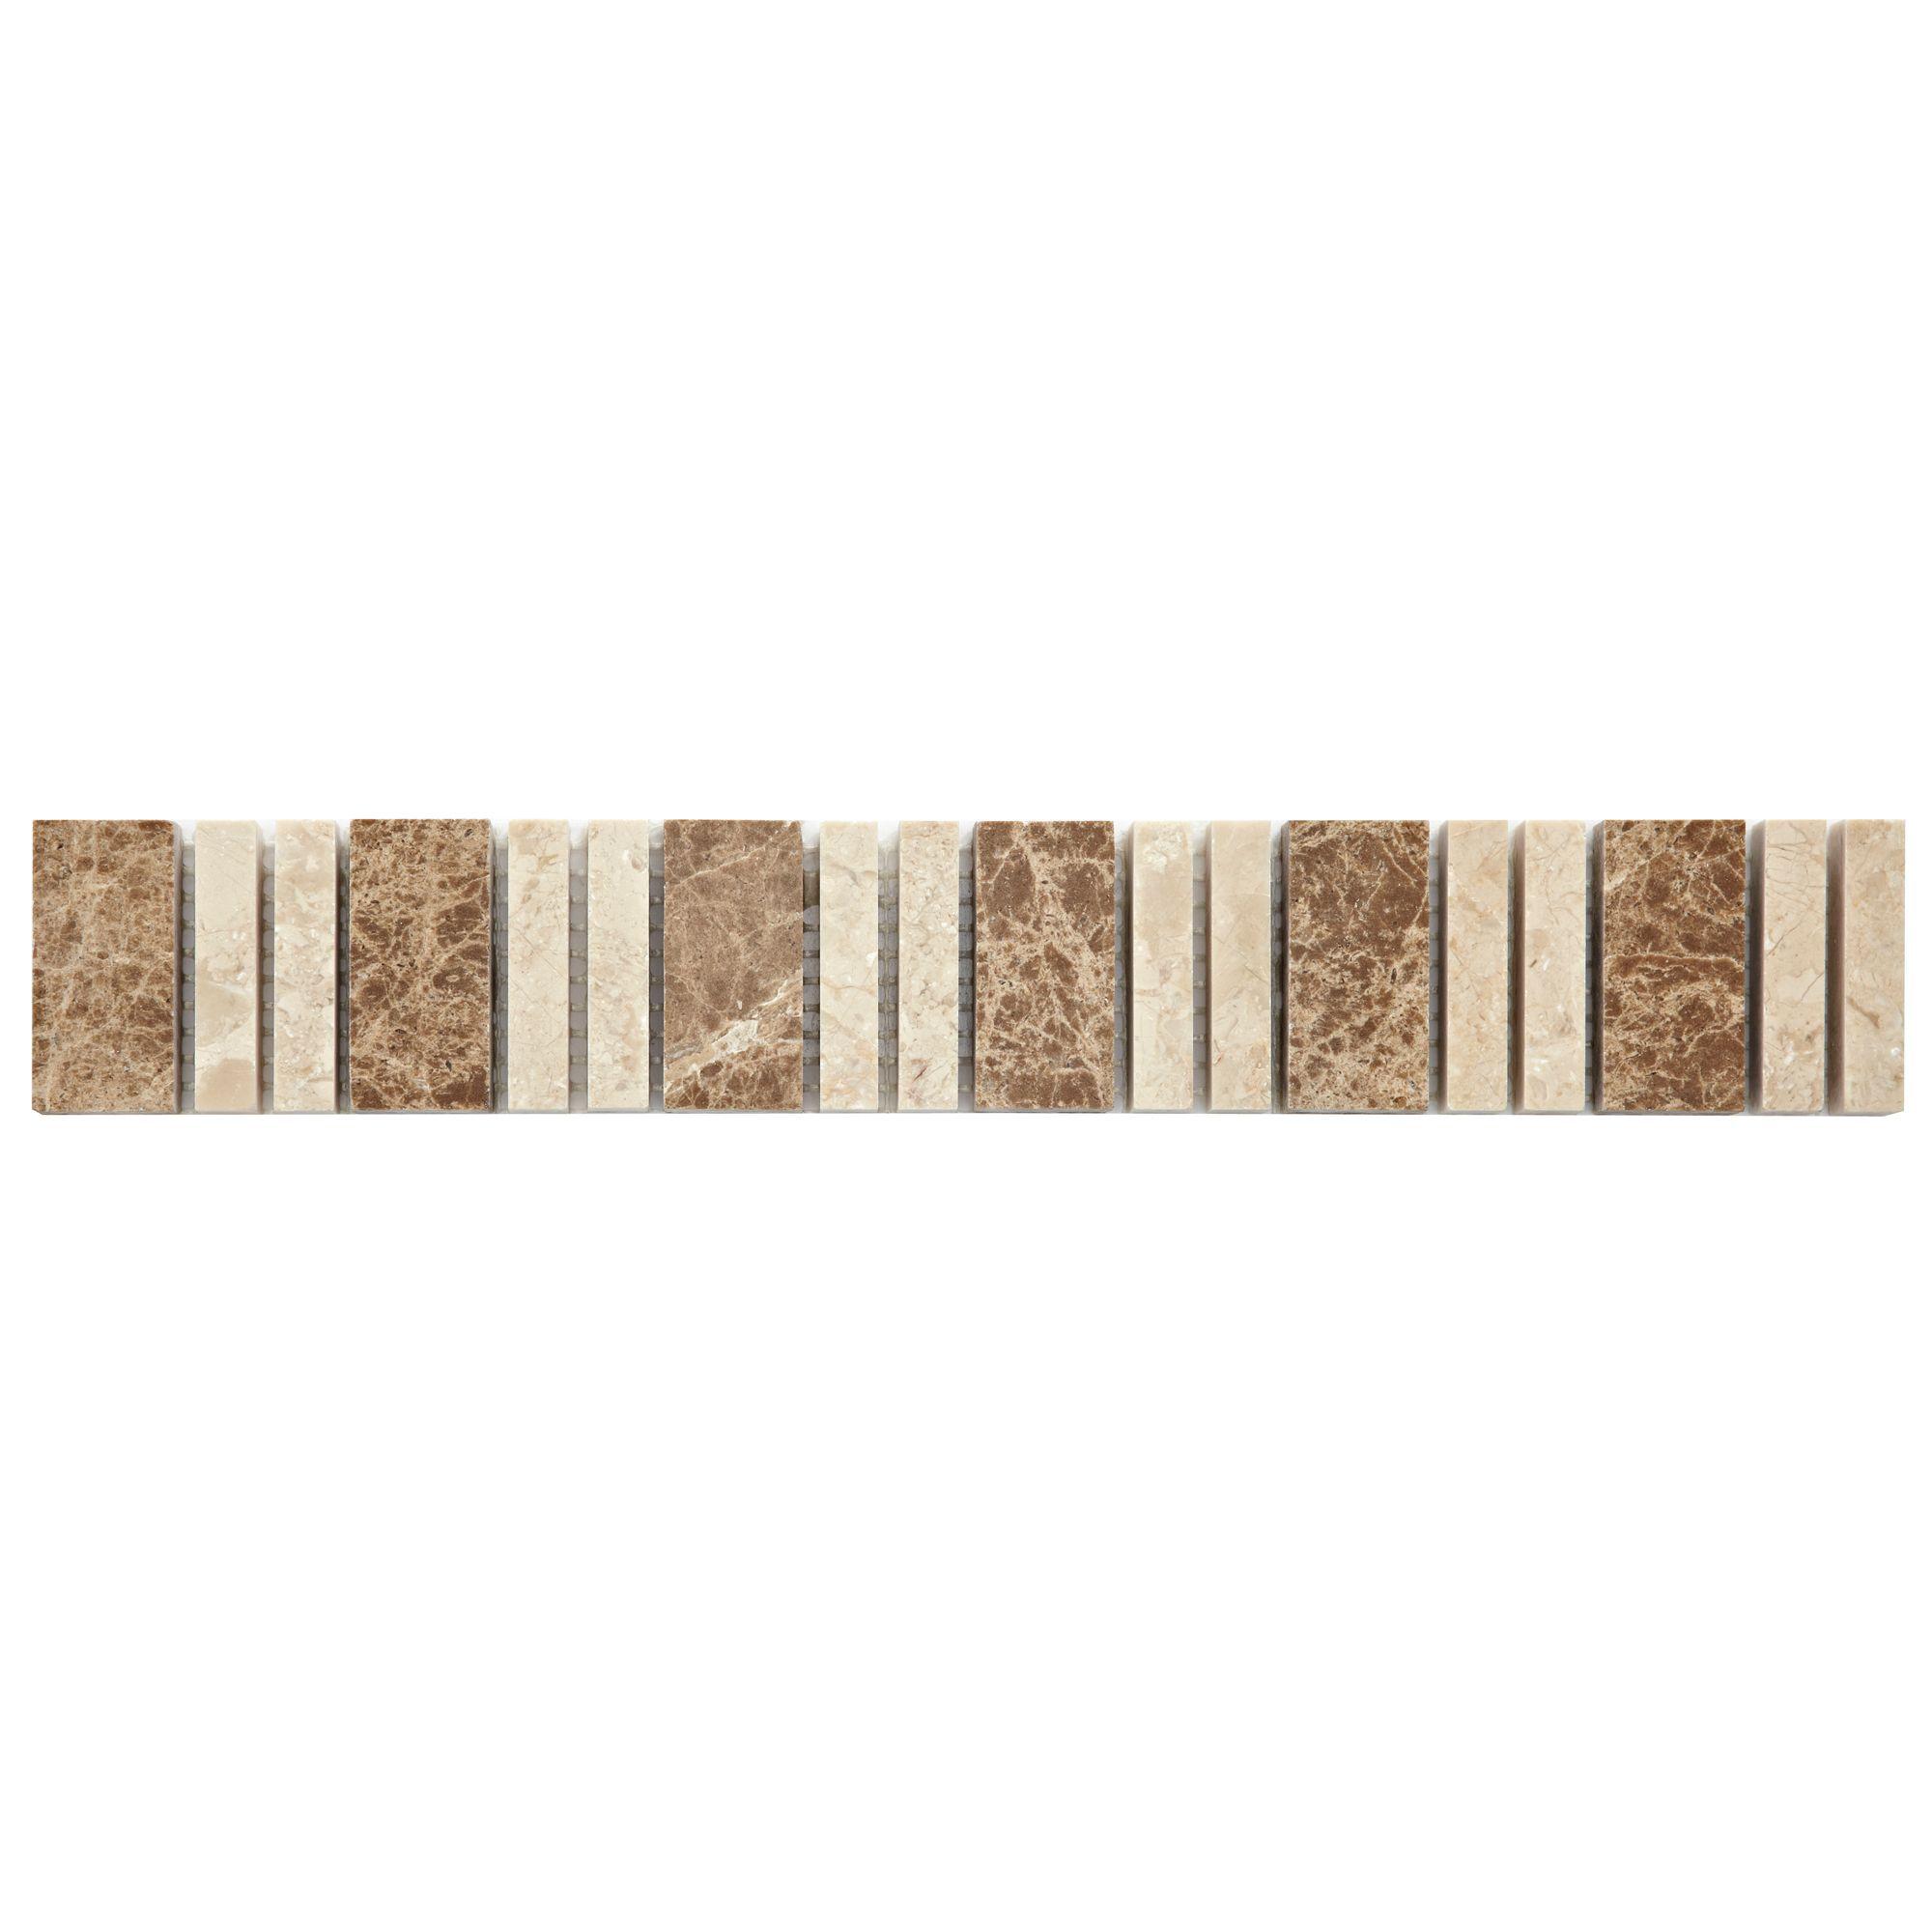 Almond Beige Stone Effect Mosaic Ceramic Border Tile, (l)305mm (w)48mm